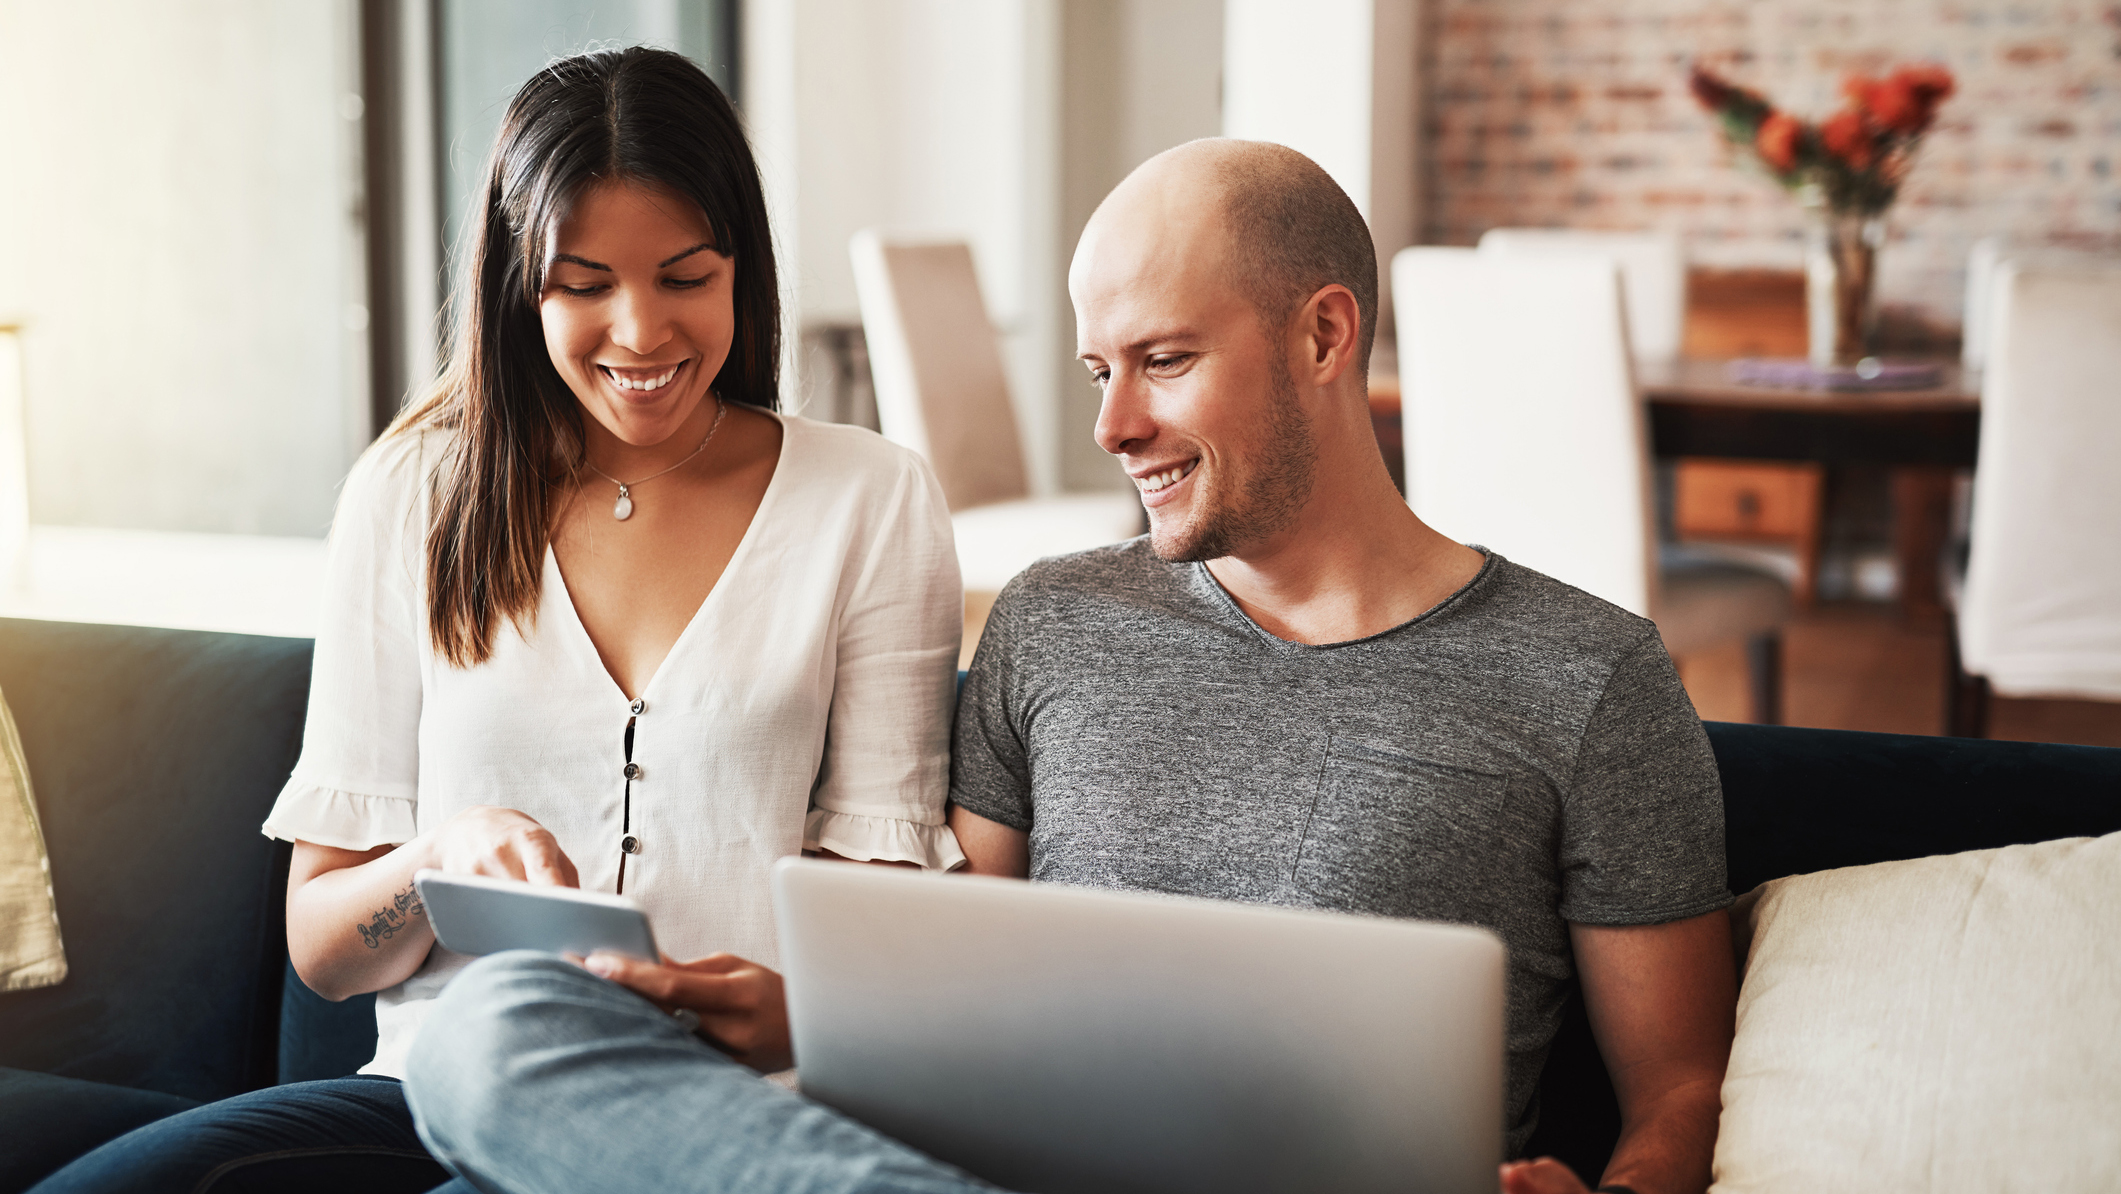 Jeune couple souriant ayant investi sereinement avec Energreen